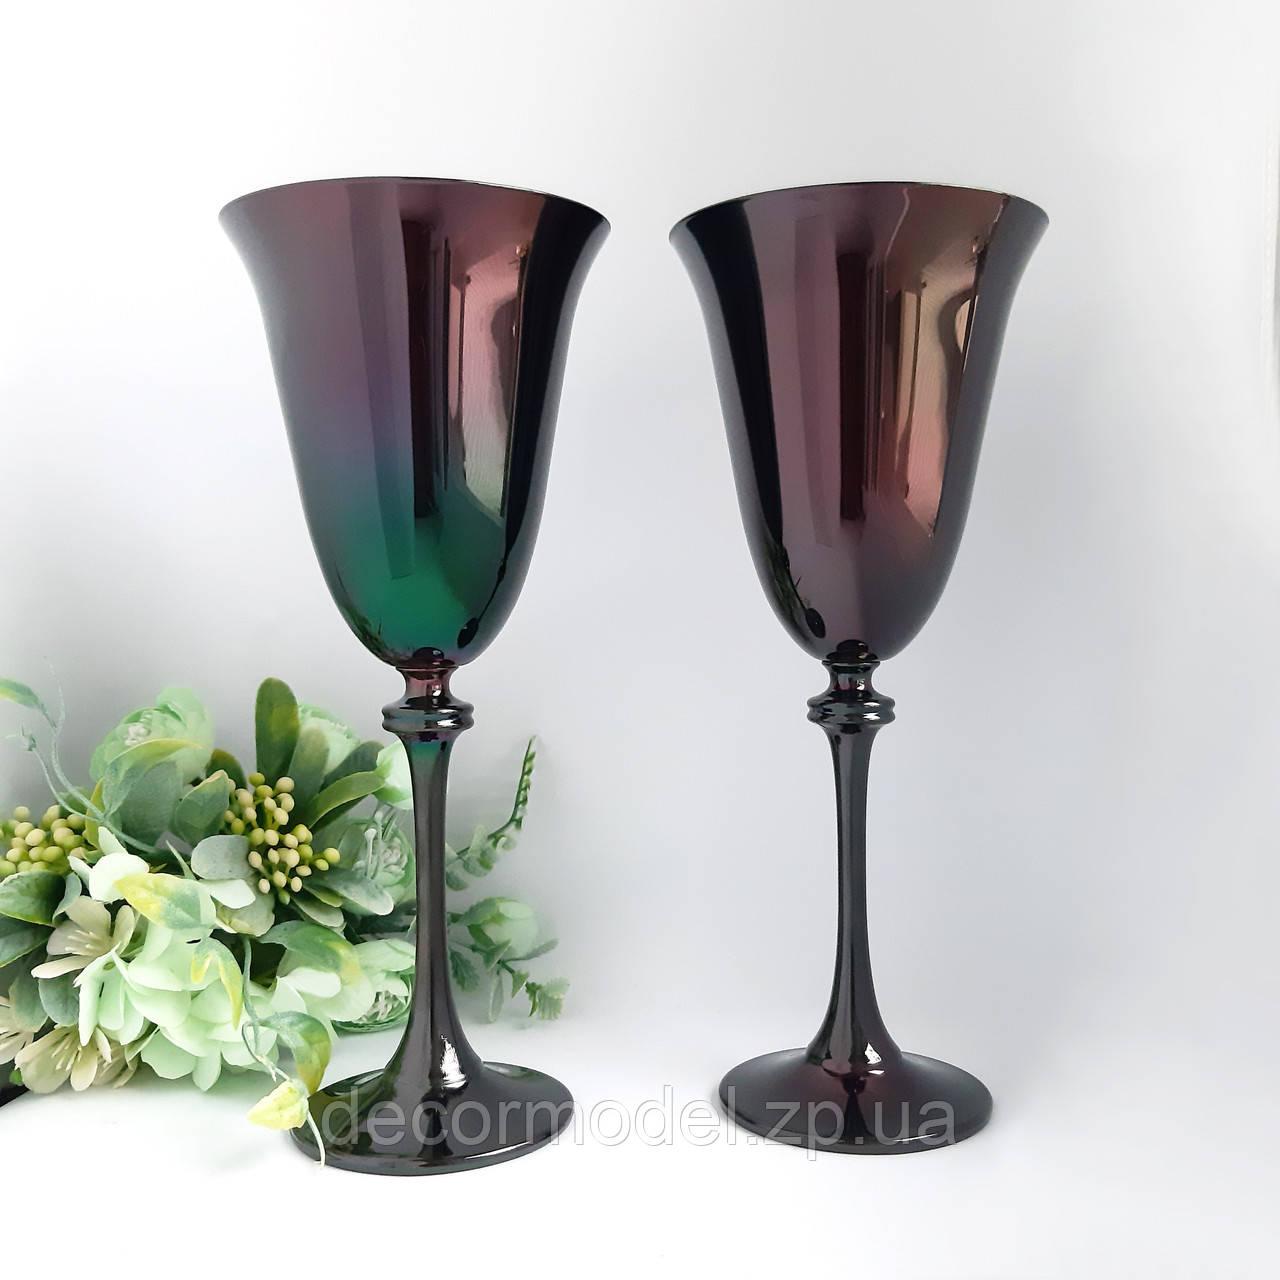 Набор бокалов для вина Bohemia Asio 350 мл черный хамелеон